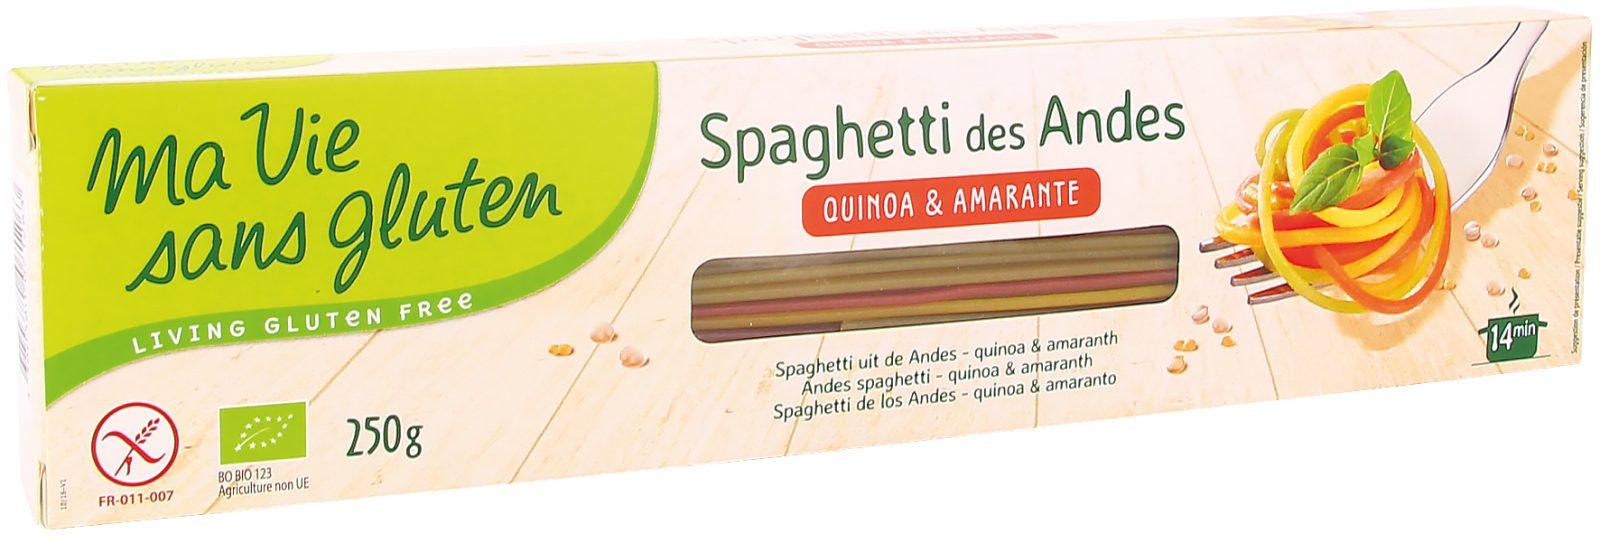 Ma vie sans gluten, spaghetti des Andes